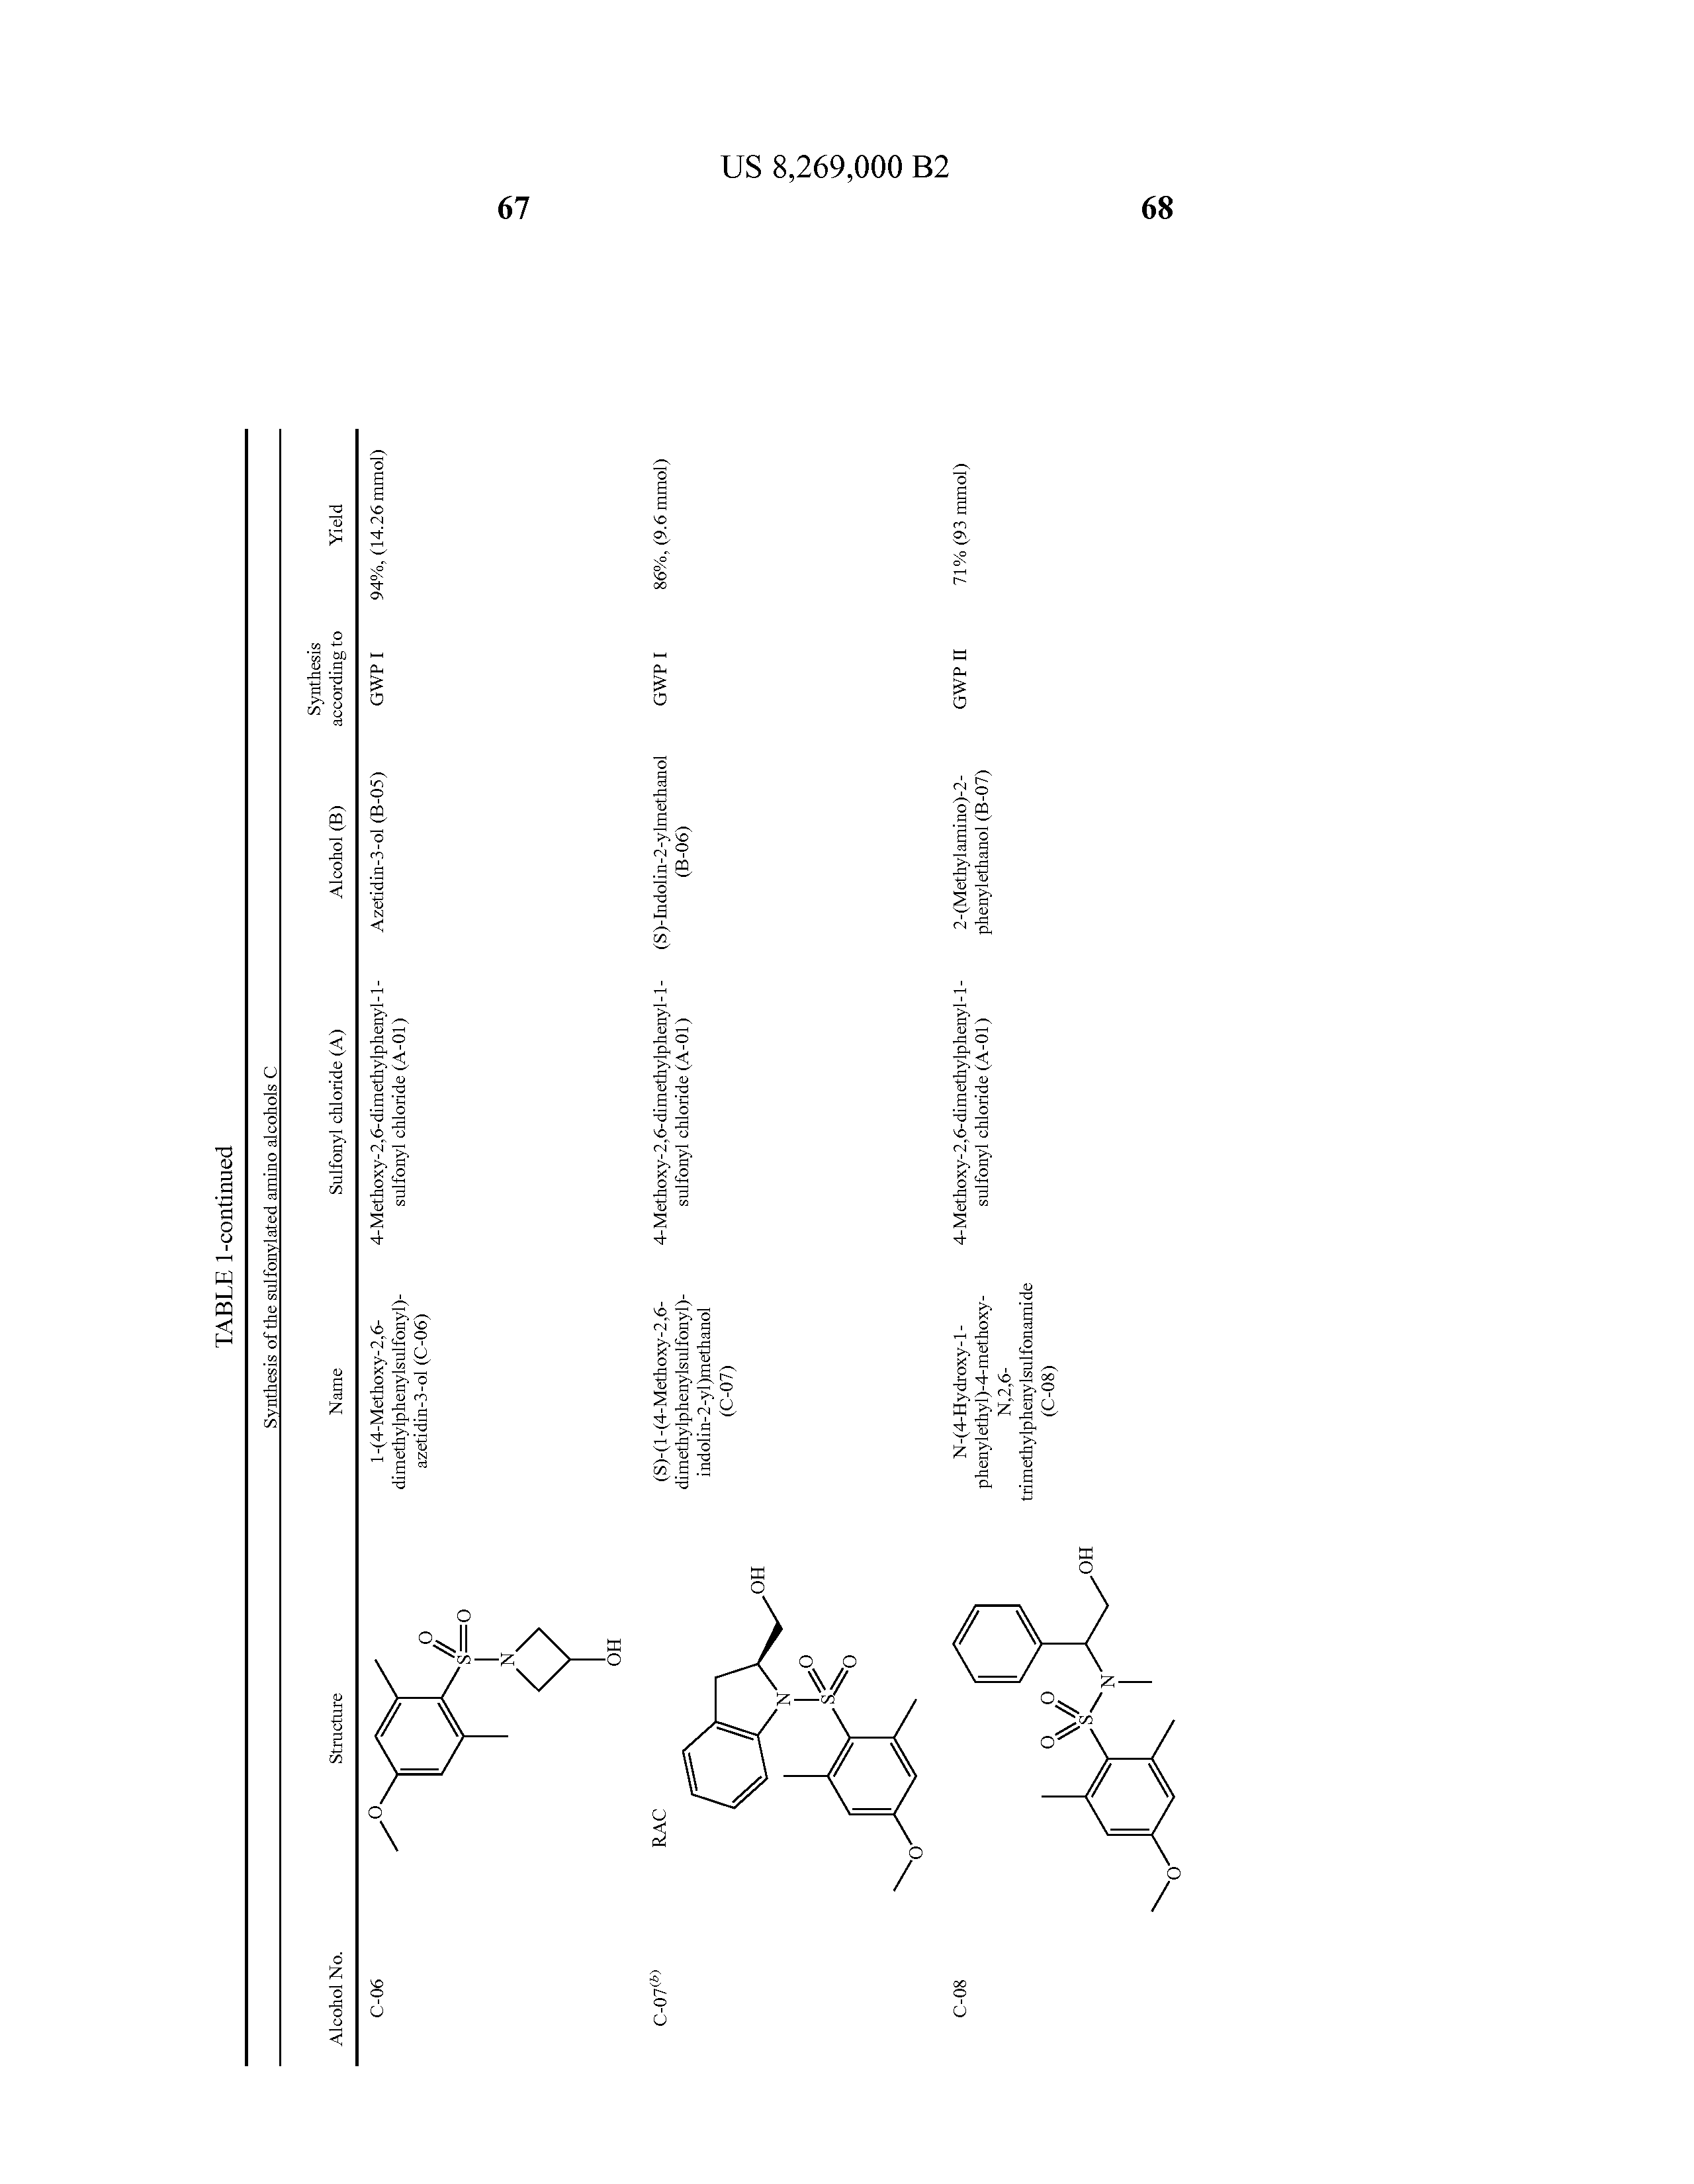 US 8269000 B2 - Substituted Pyrimidine And Triazine